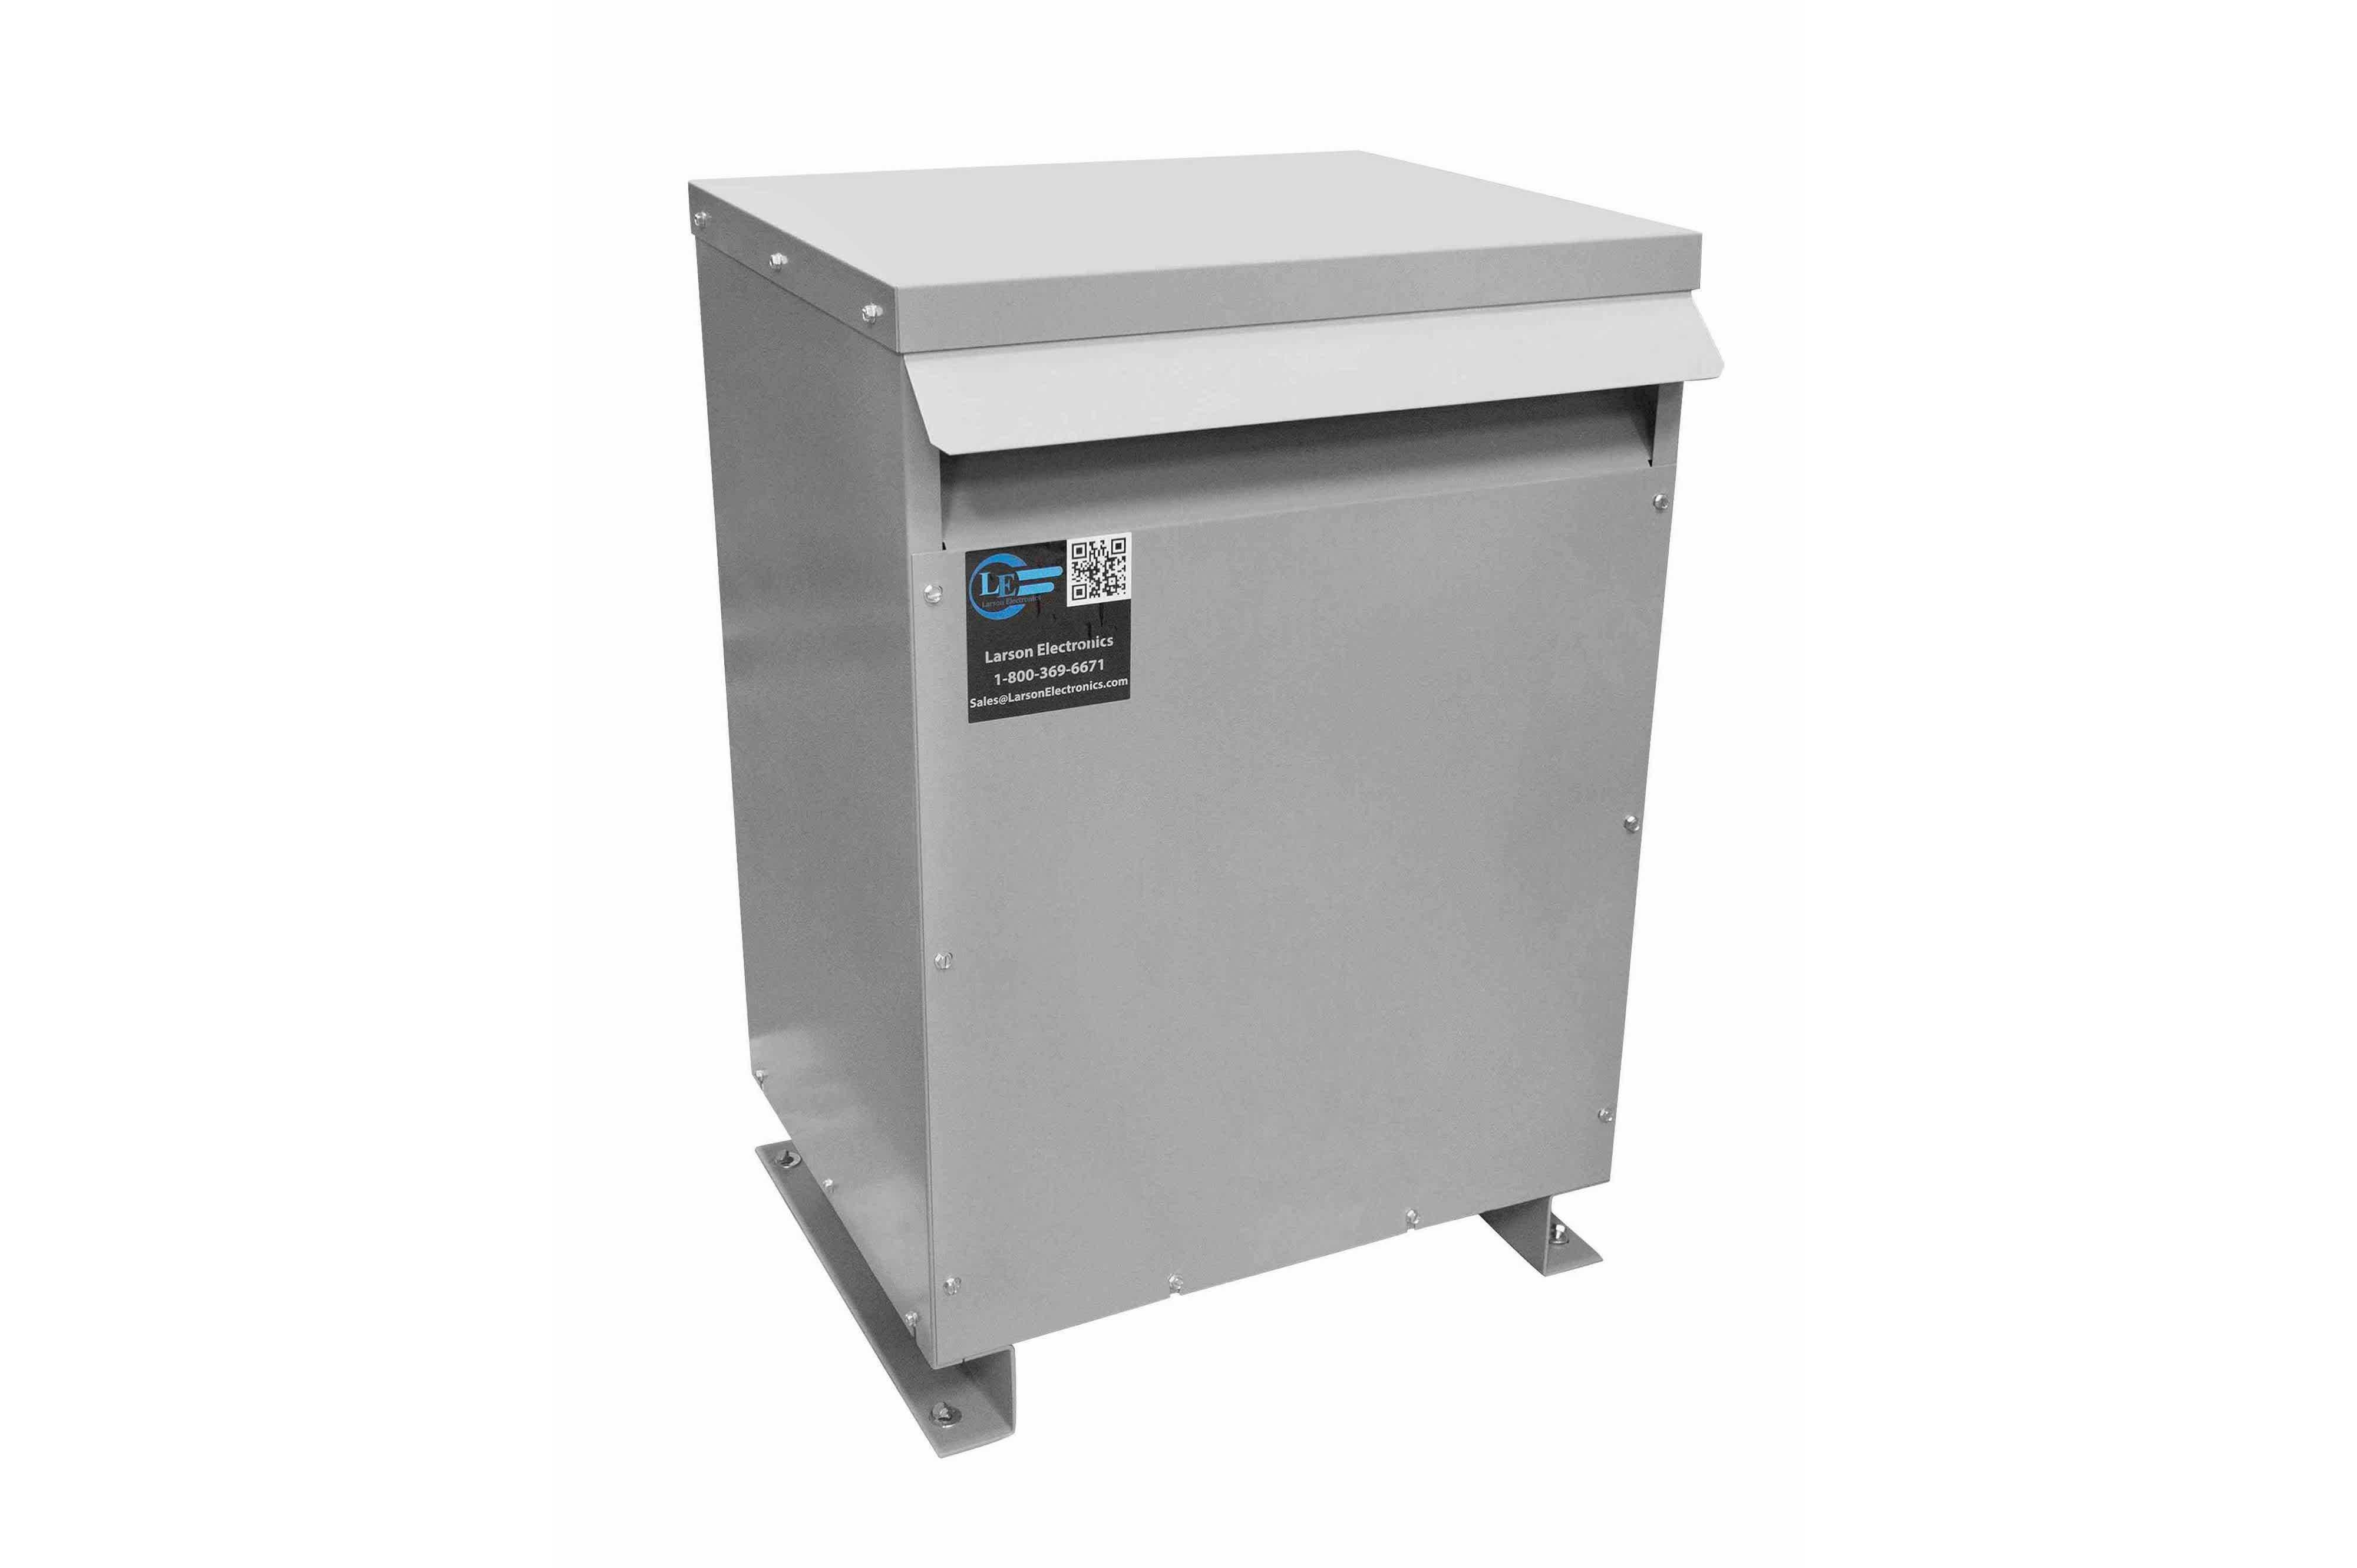 10 kVA 3PH Isolation Transformer, 208V Wye Primary, 480Y/277 Wye-N Secondary, N3R, Ventilated, 60 Hz